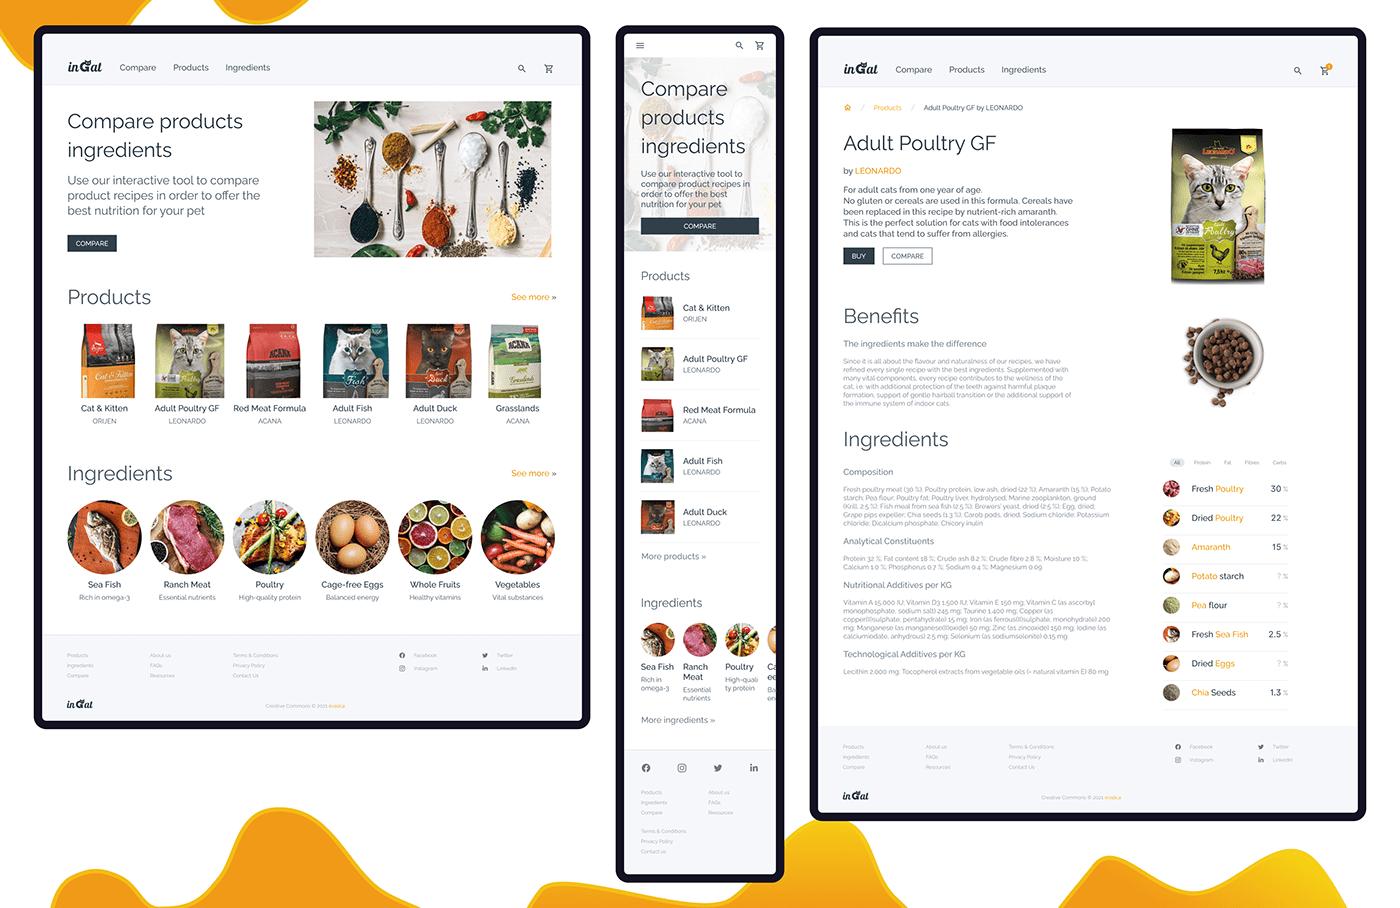 CaseStudy cat food ingredients Mobile app responsive website User research Interaction design  visual design